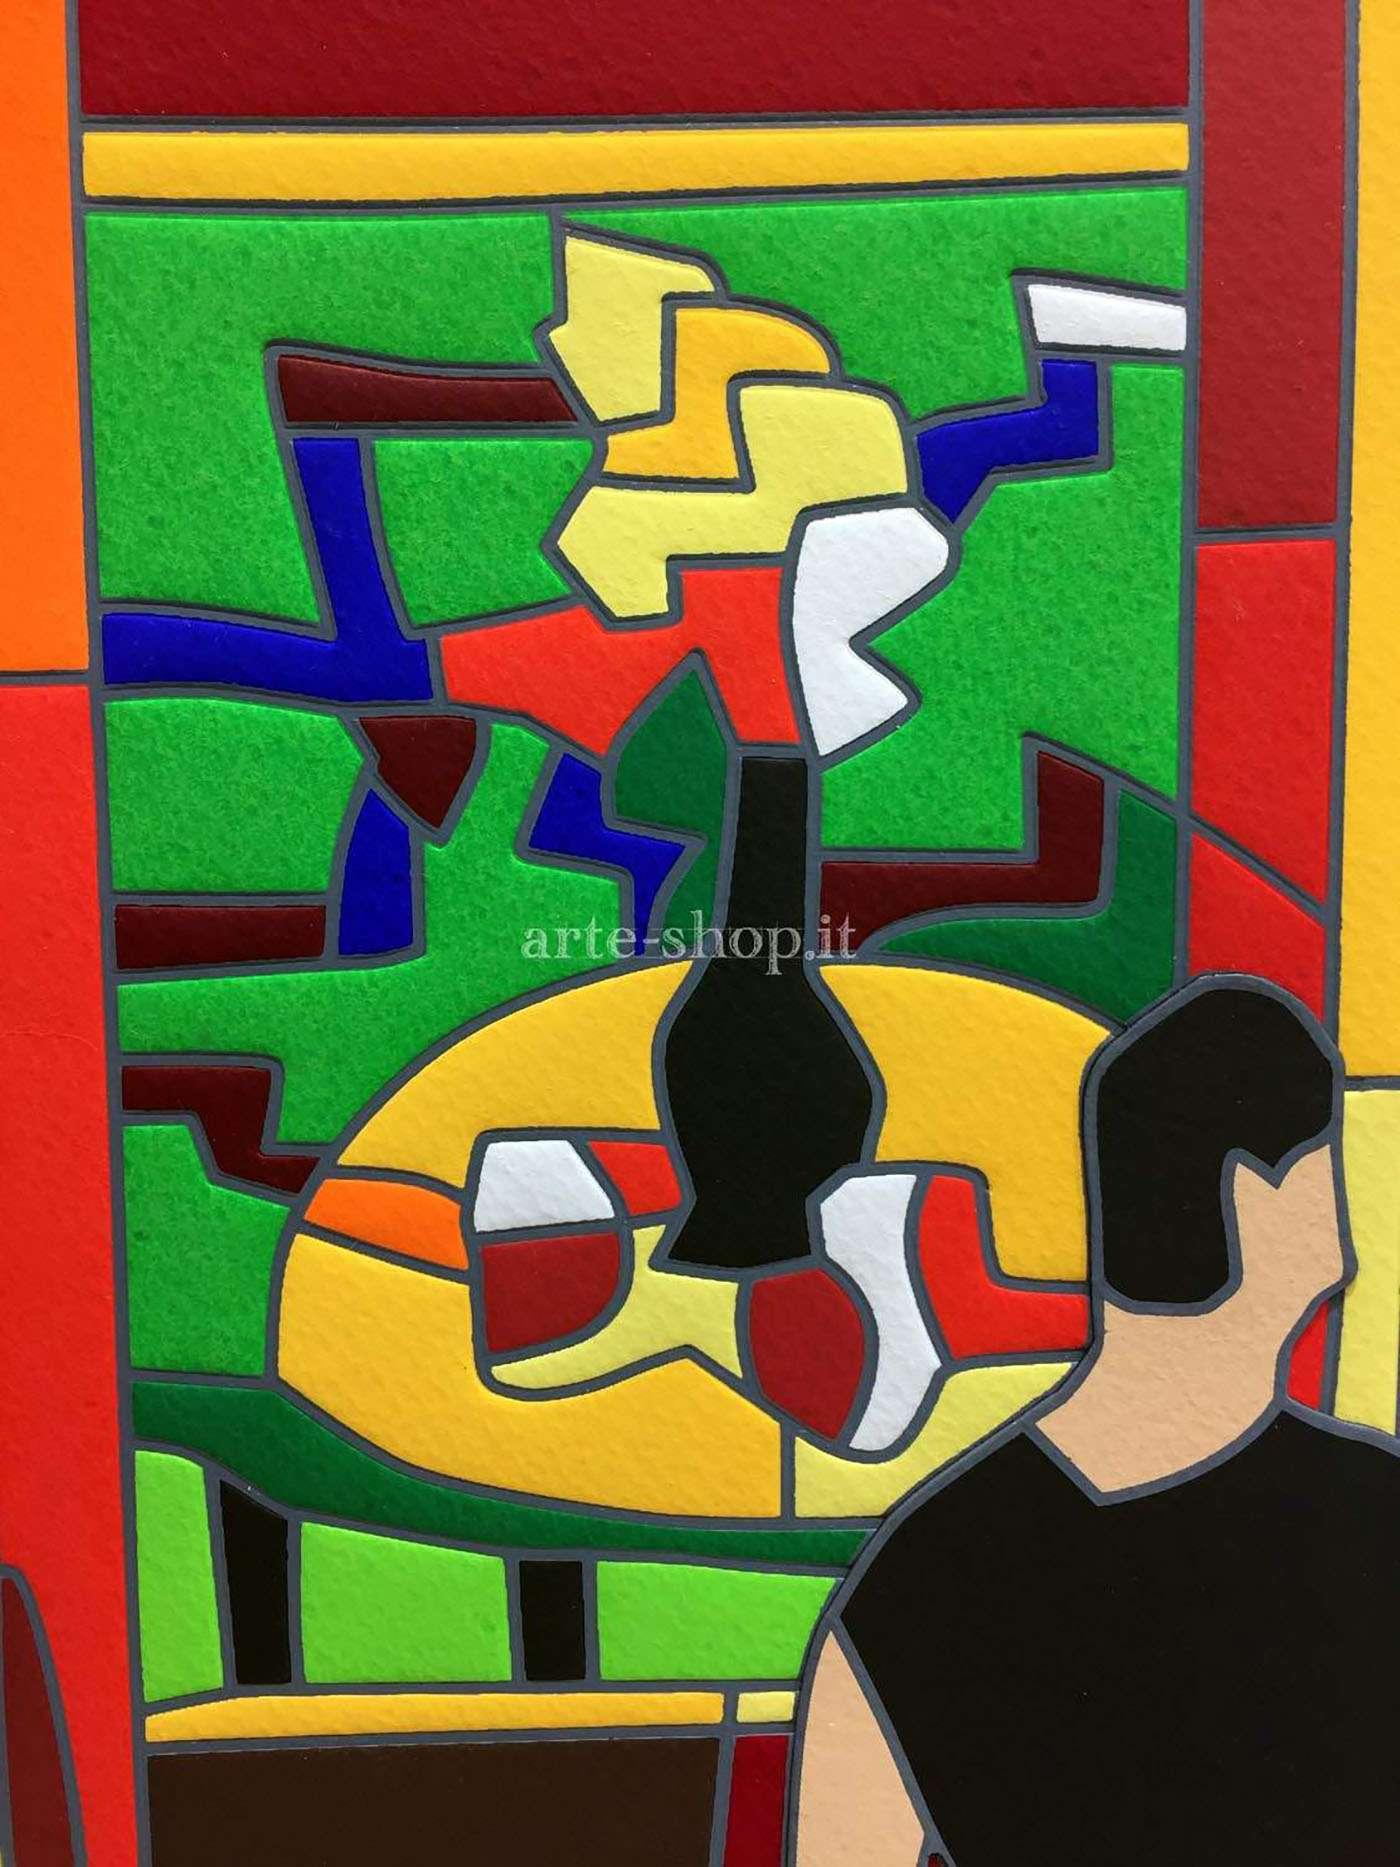 arte pentagono shop dettaglio numero 373